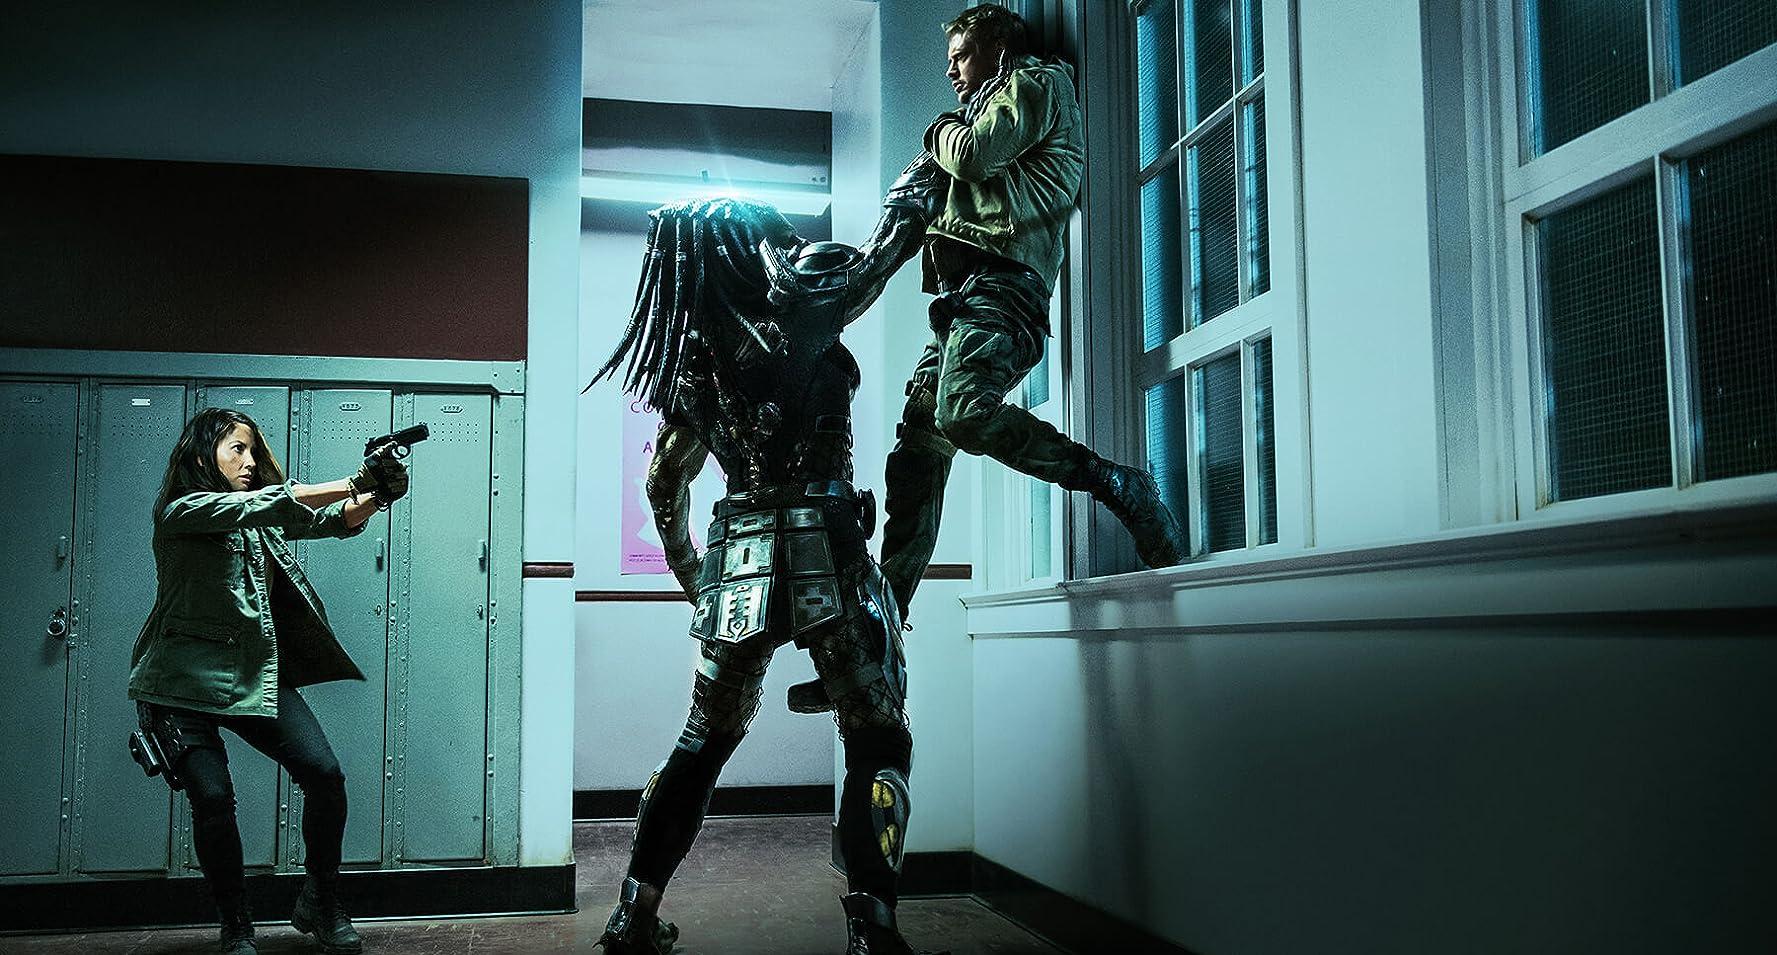 Olivia Munn and Boyd Holbrook in The Predator (2018)